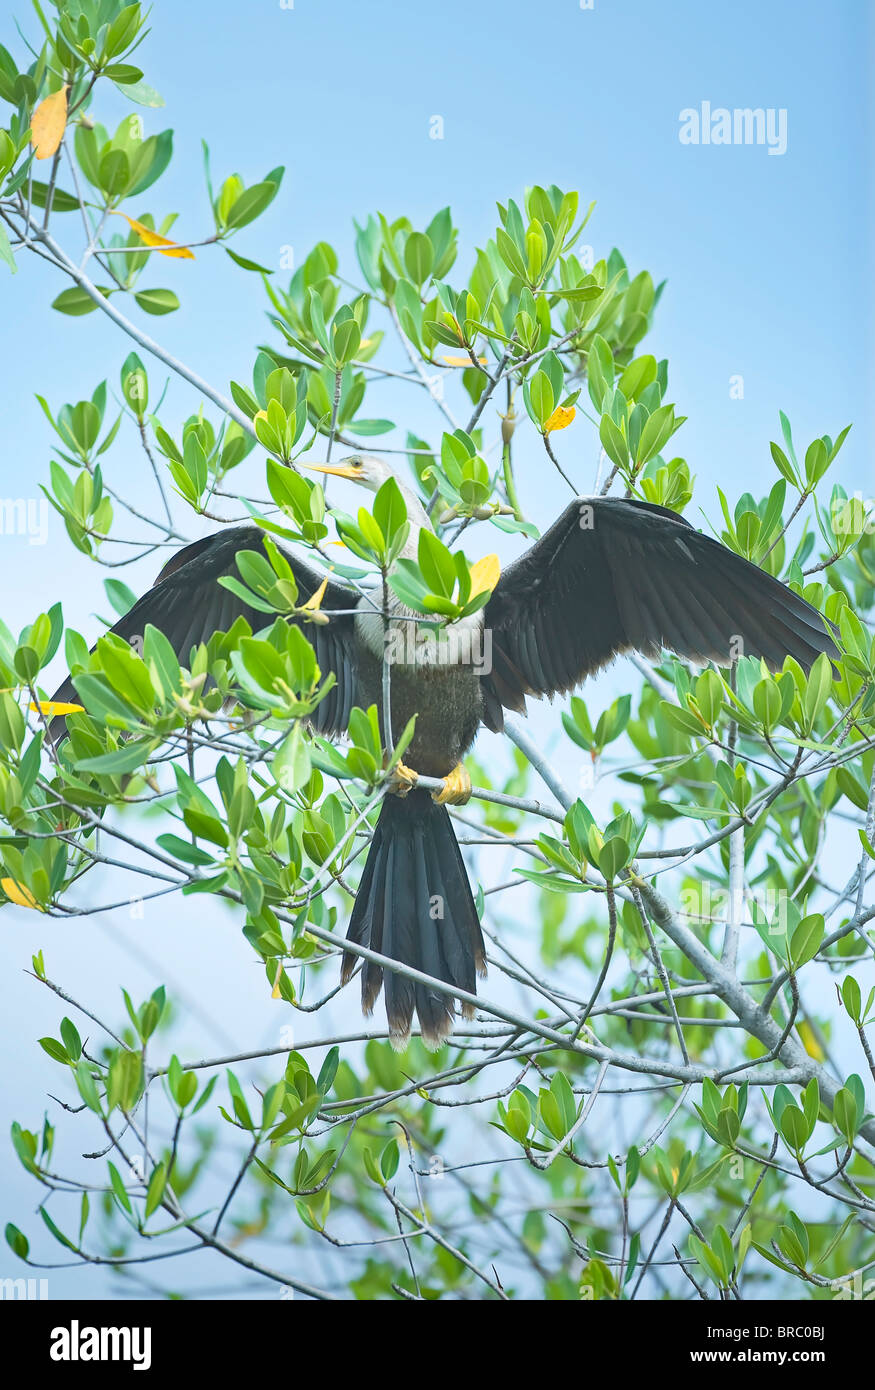 Anhinga spreading wings, Sanibel Island, J. N. Ding Darling National Wildlife Refuge, Florida, USA - Stock Image